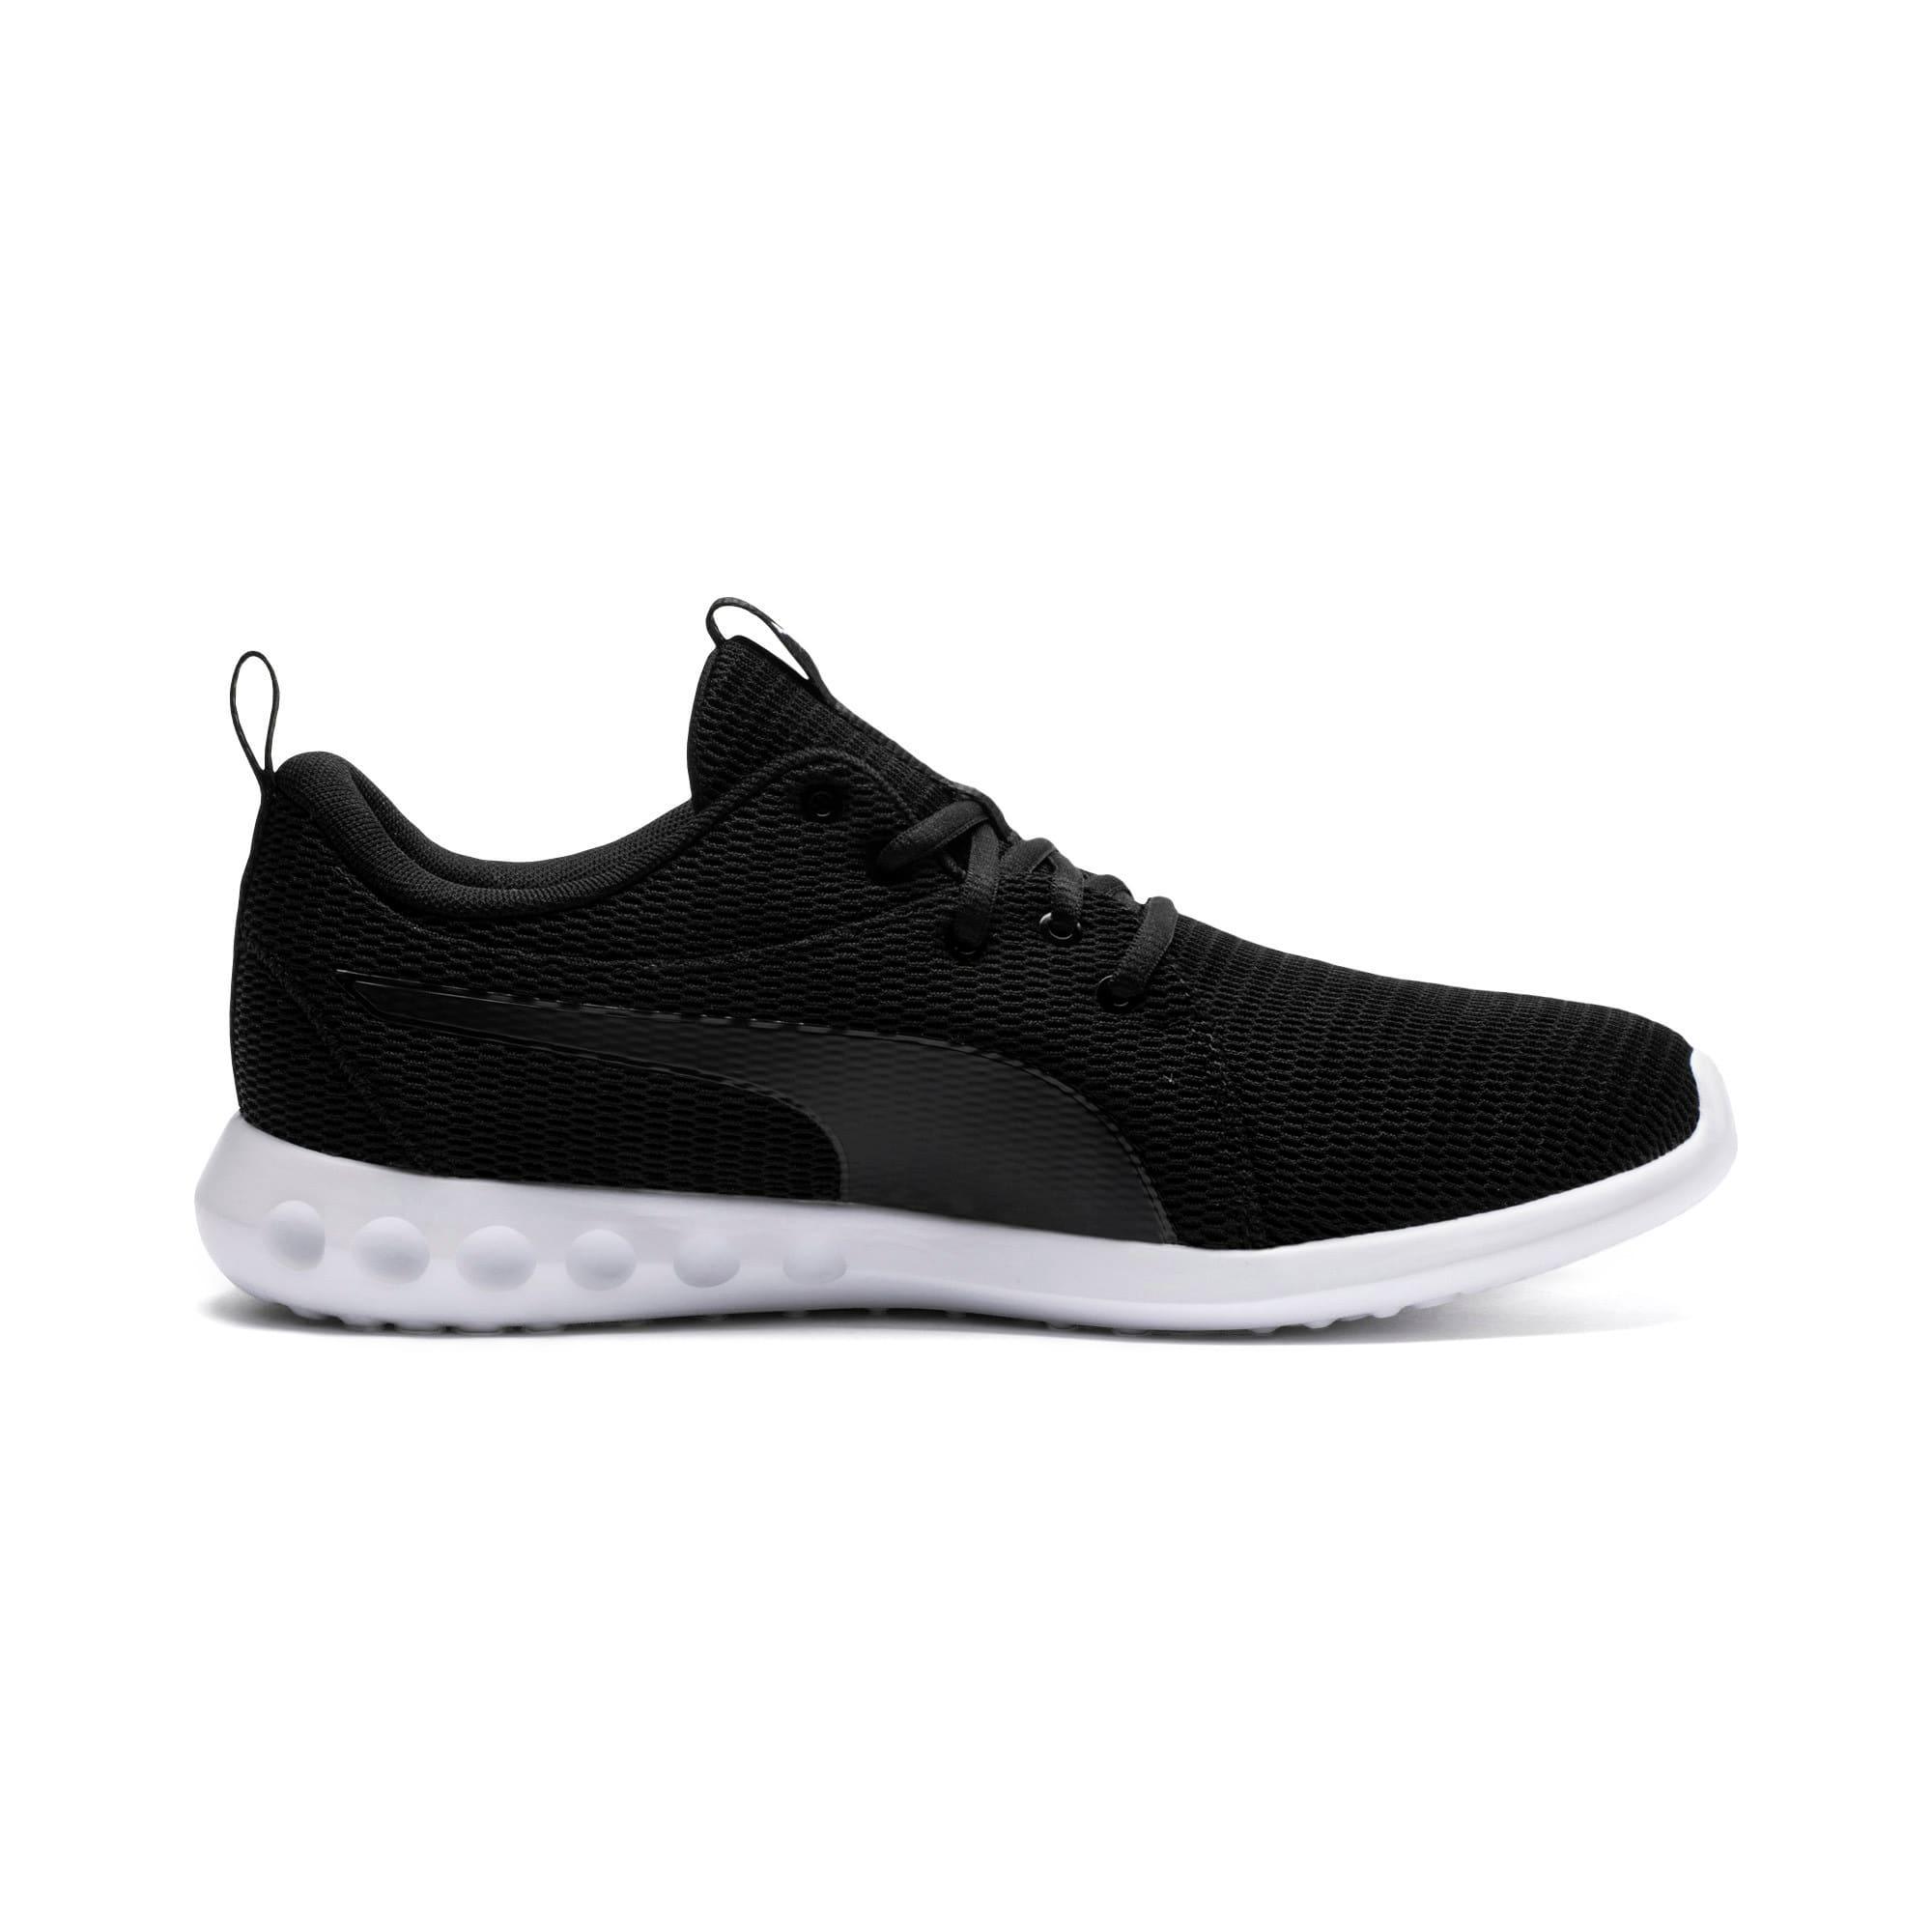 Miniatura 5 de Zapatos para correrCarson 2 New Corepara hombre, Puma Black-Puma White, mediano